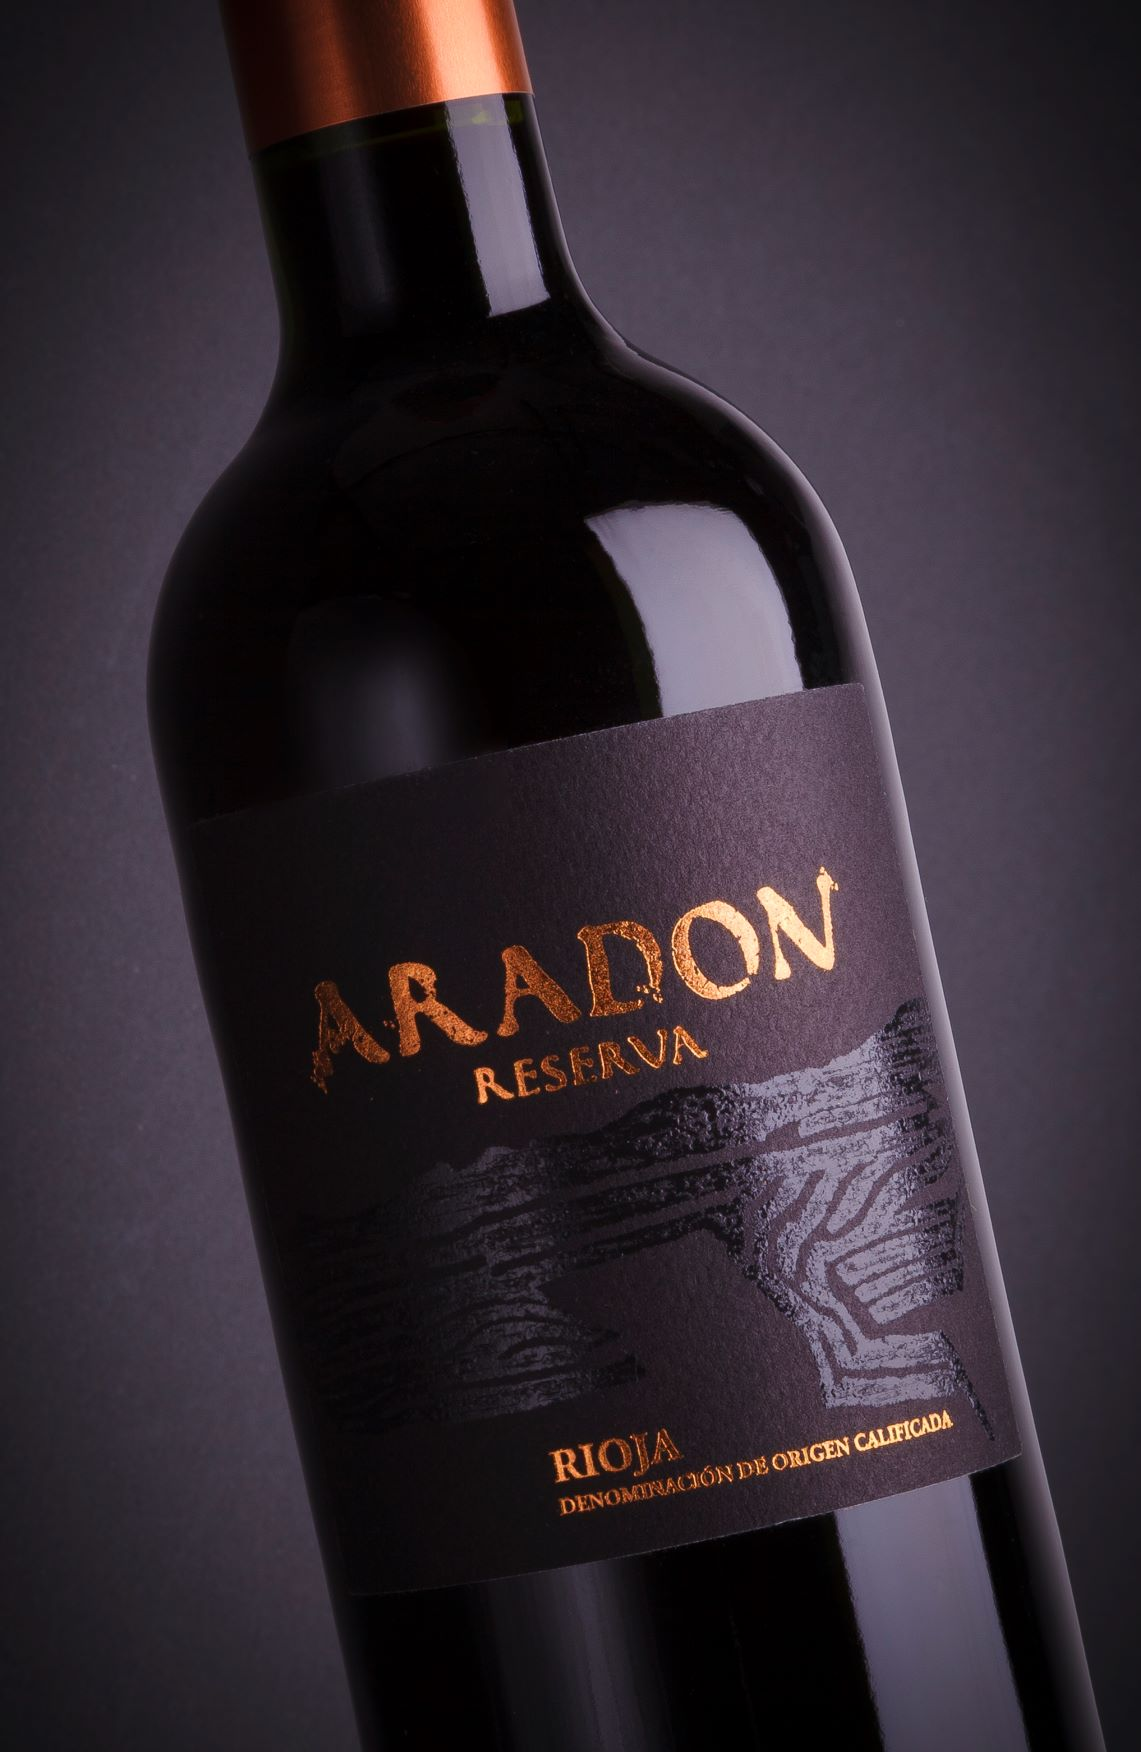 Aradon Reserva